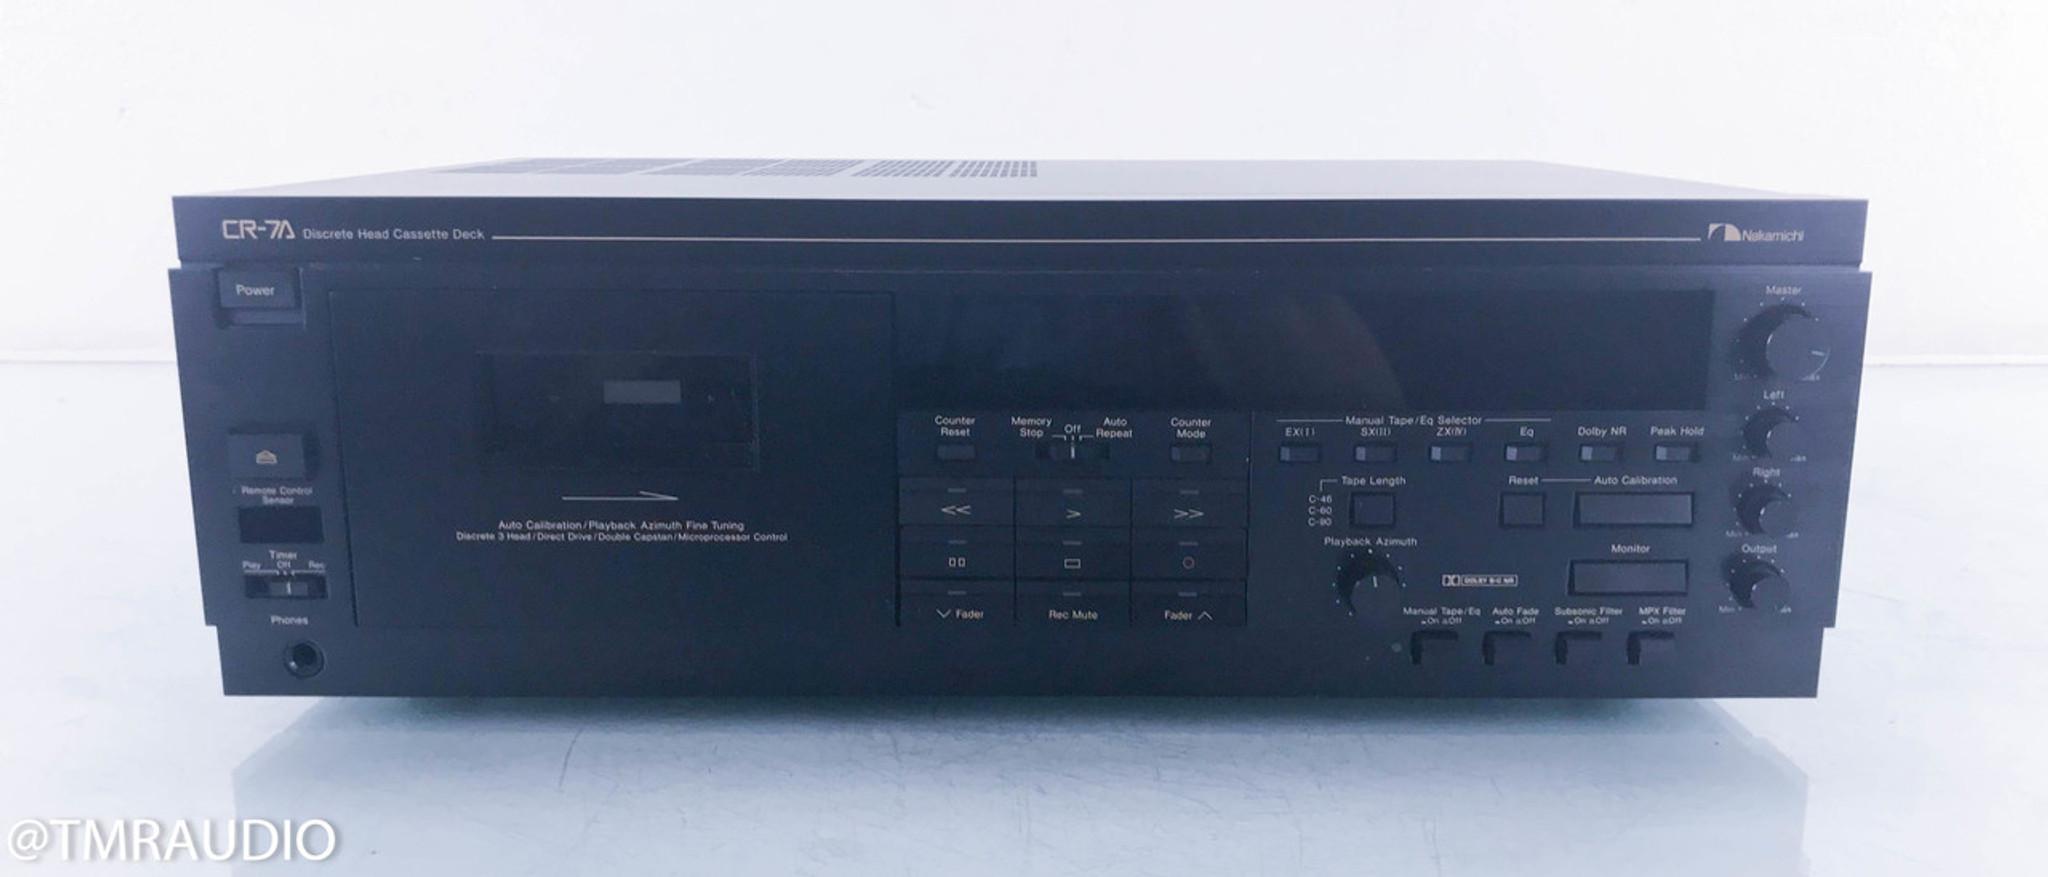 nakamichi cr 7a cassette deck tape recorder remote recently rh tmraudio com Nakamichi Car Audio Nakamichi Earphone